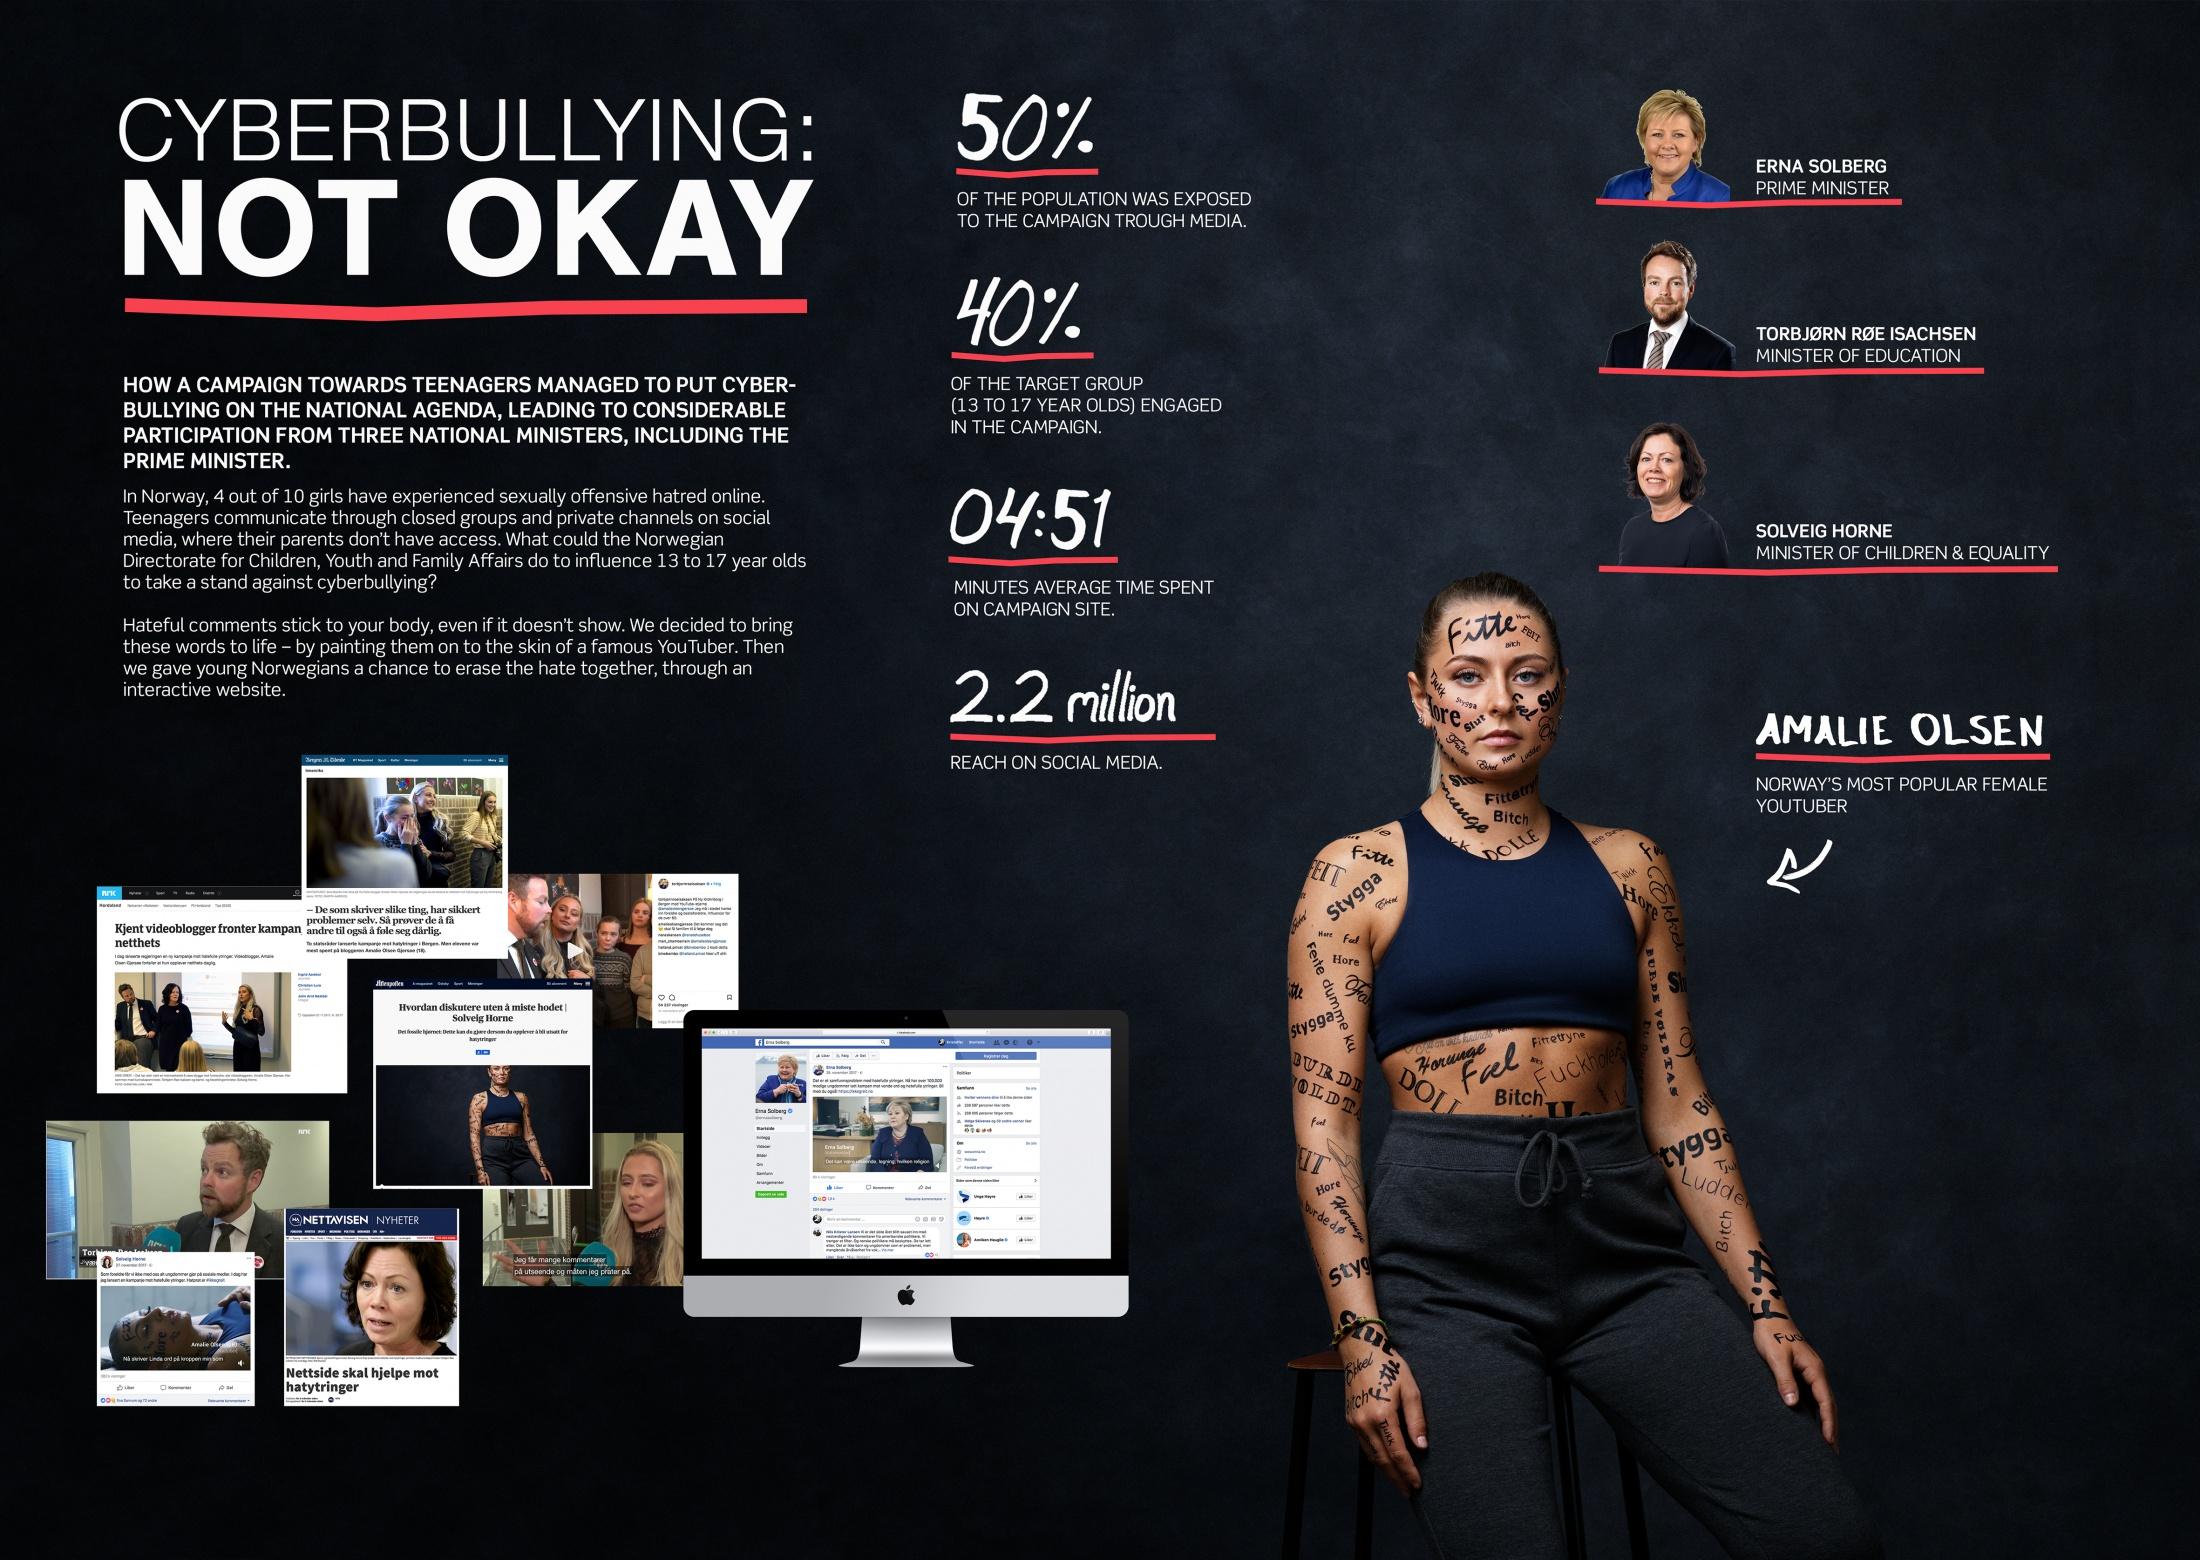 Thumbnail for Cyberbullying: Not Okay